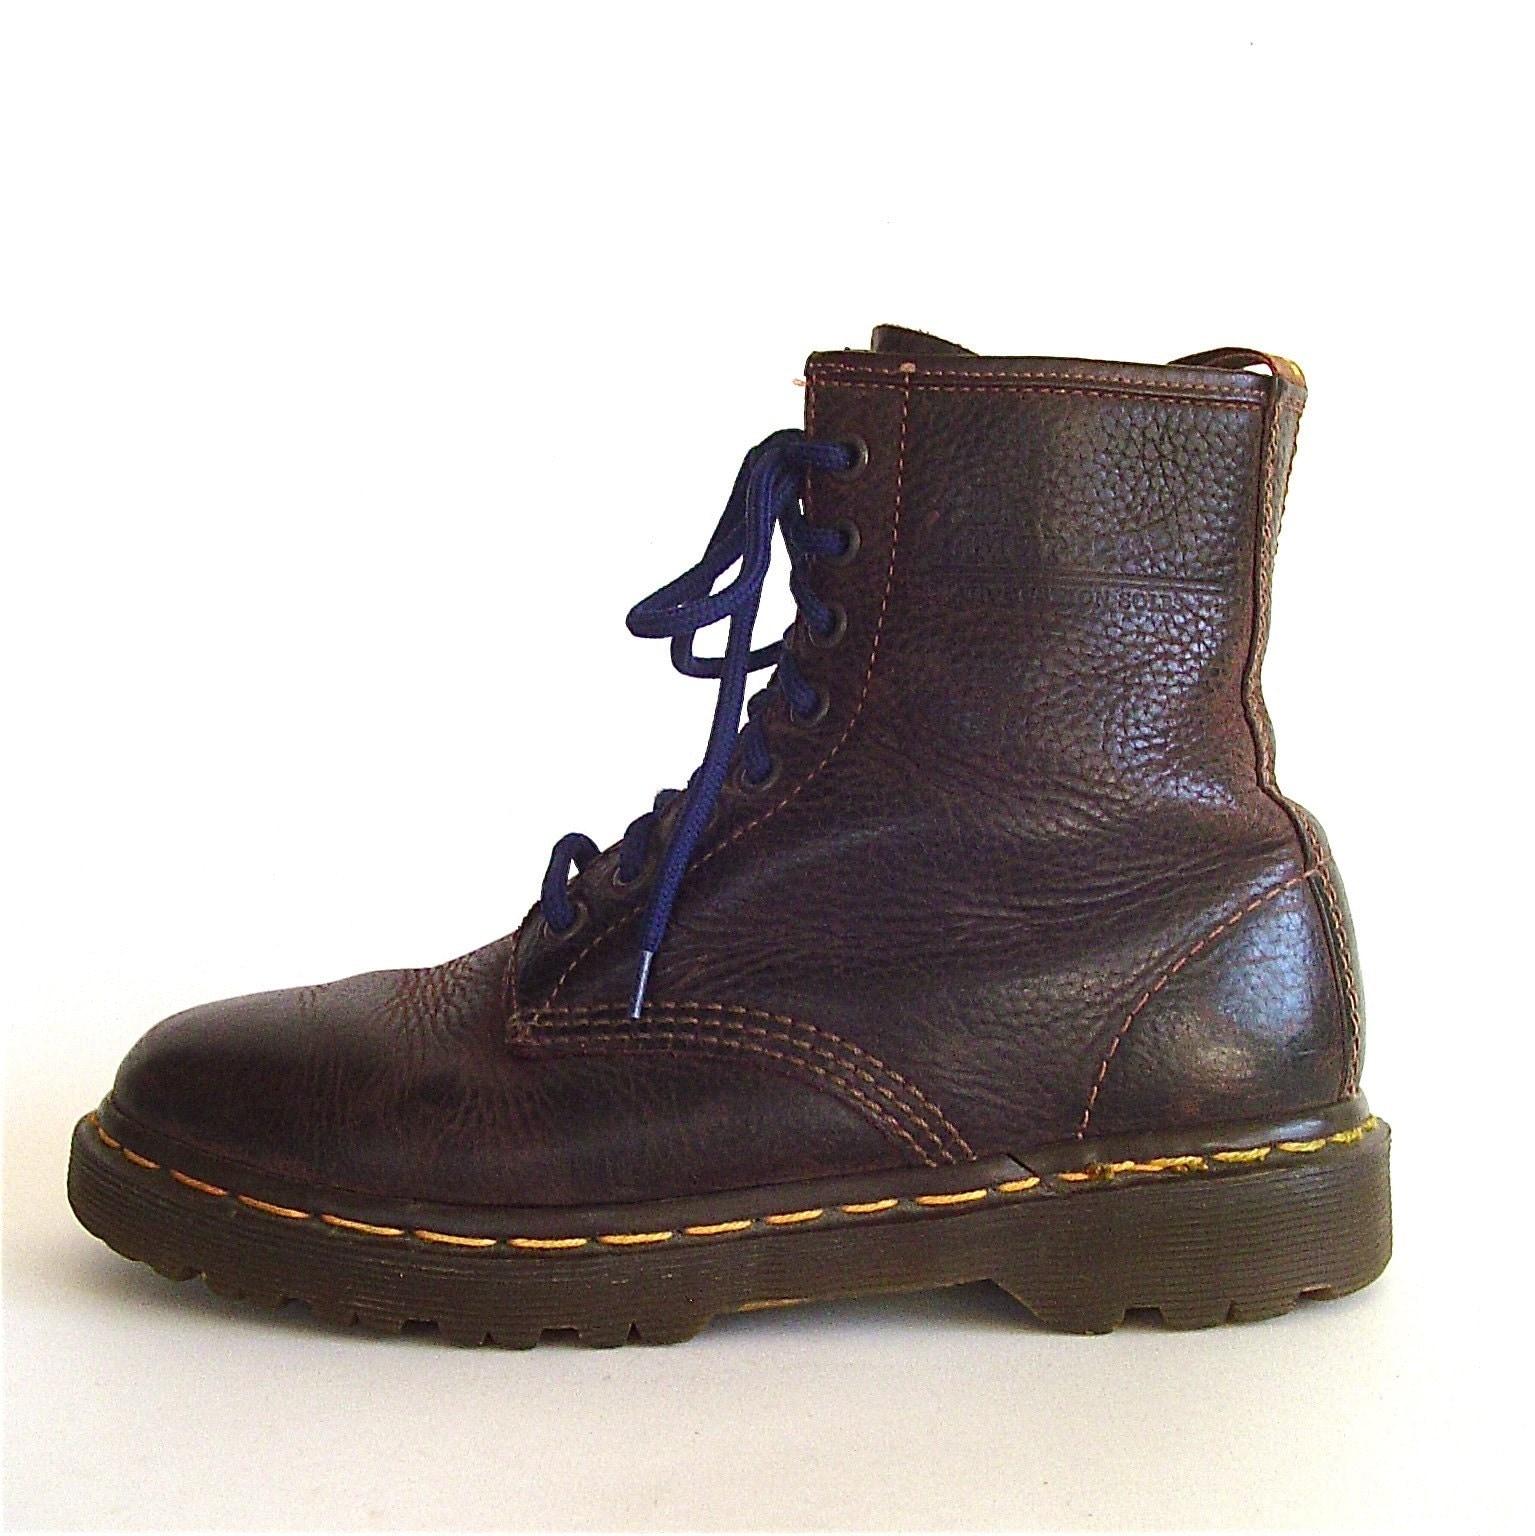 vintage doc martens brown leather combat boots